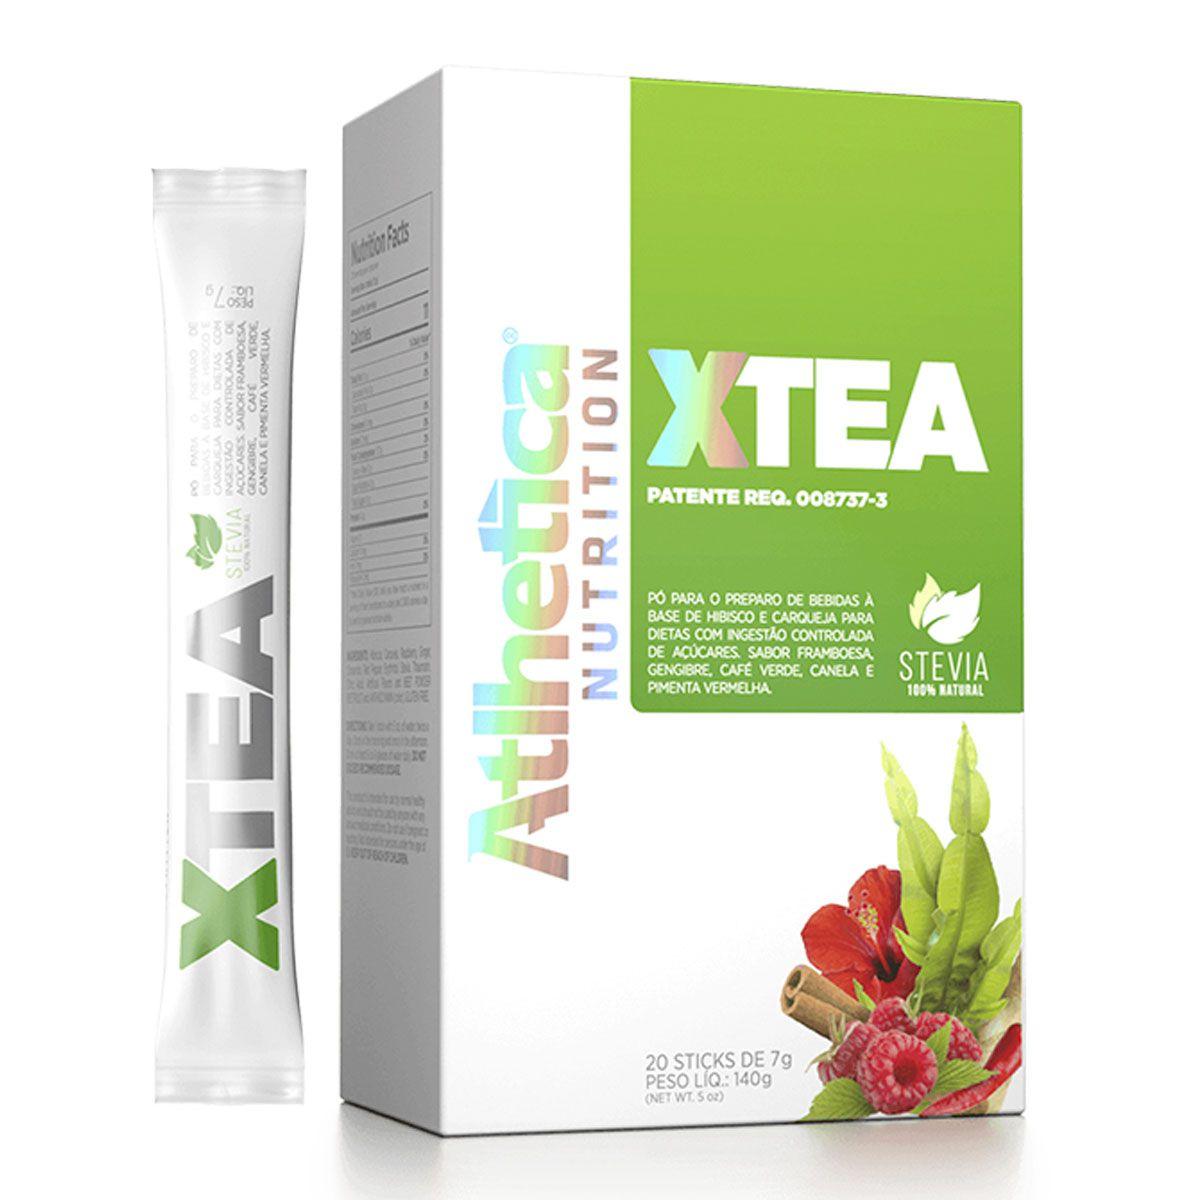 Xtea - Chá Diurético - 20 Unidades